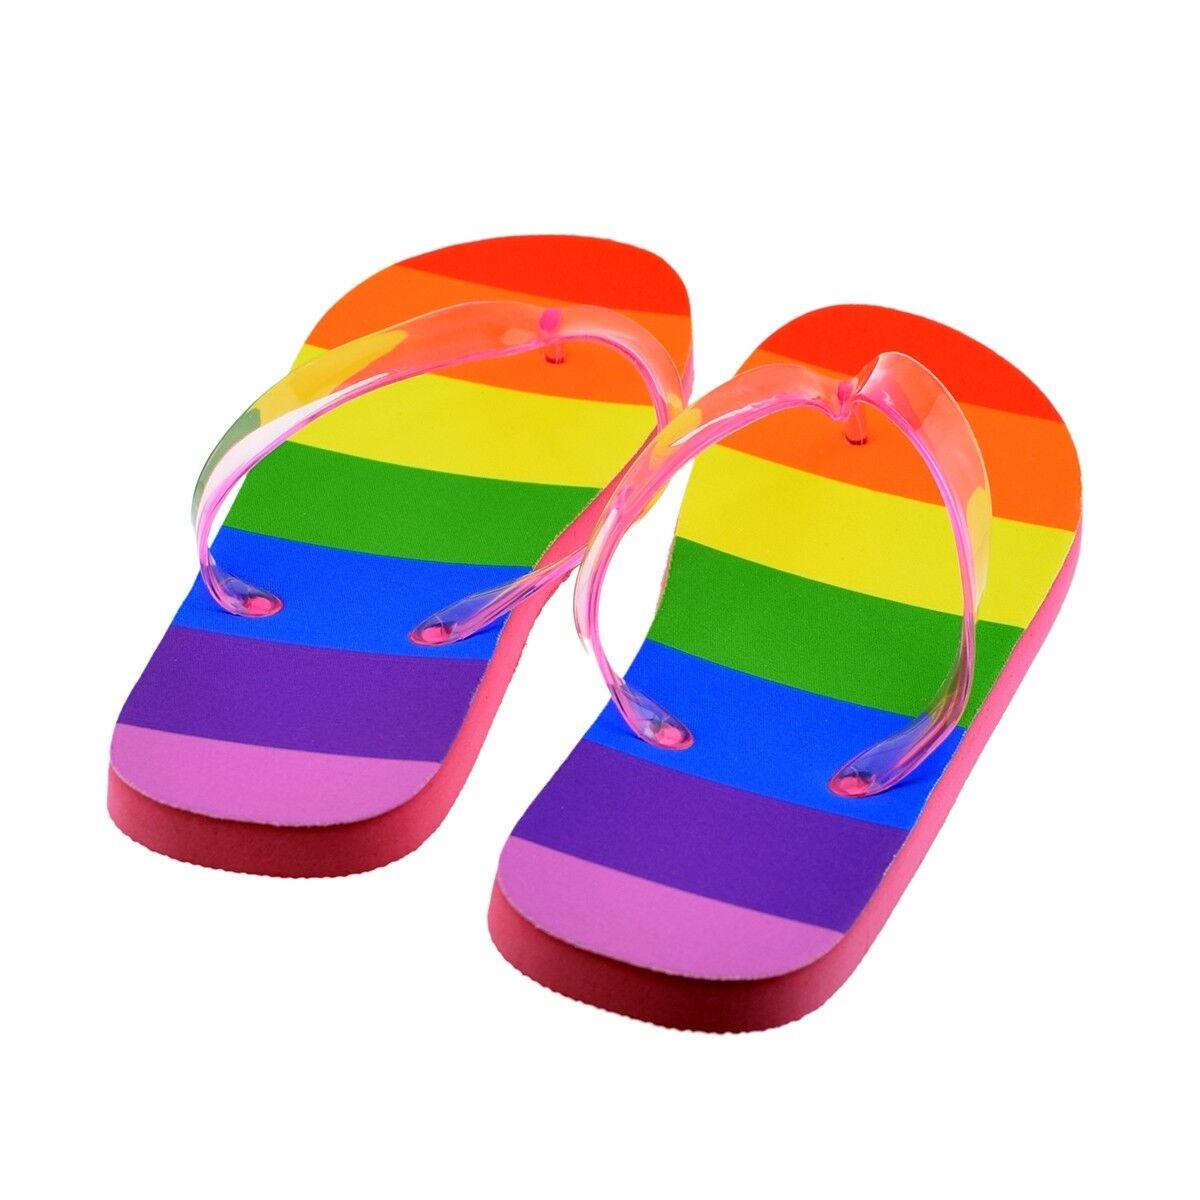 LADIES MEDIUM Gay Rainbow Flip Flops PRESENT SANDALS BEACH SHOES THONGS PRESENT Flops GIFT 9bc7f7